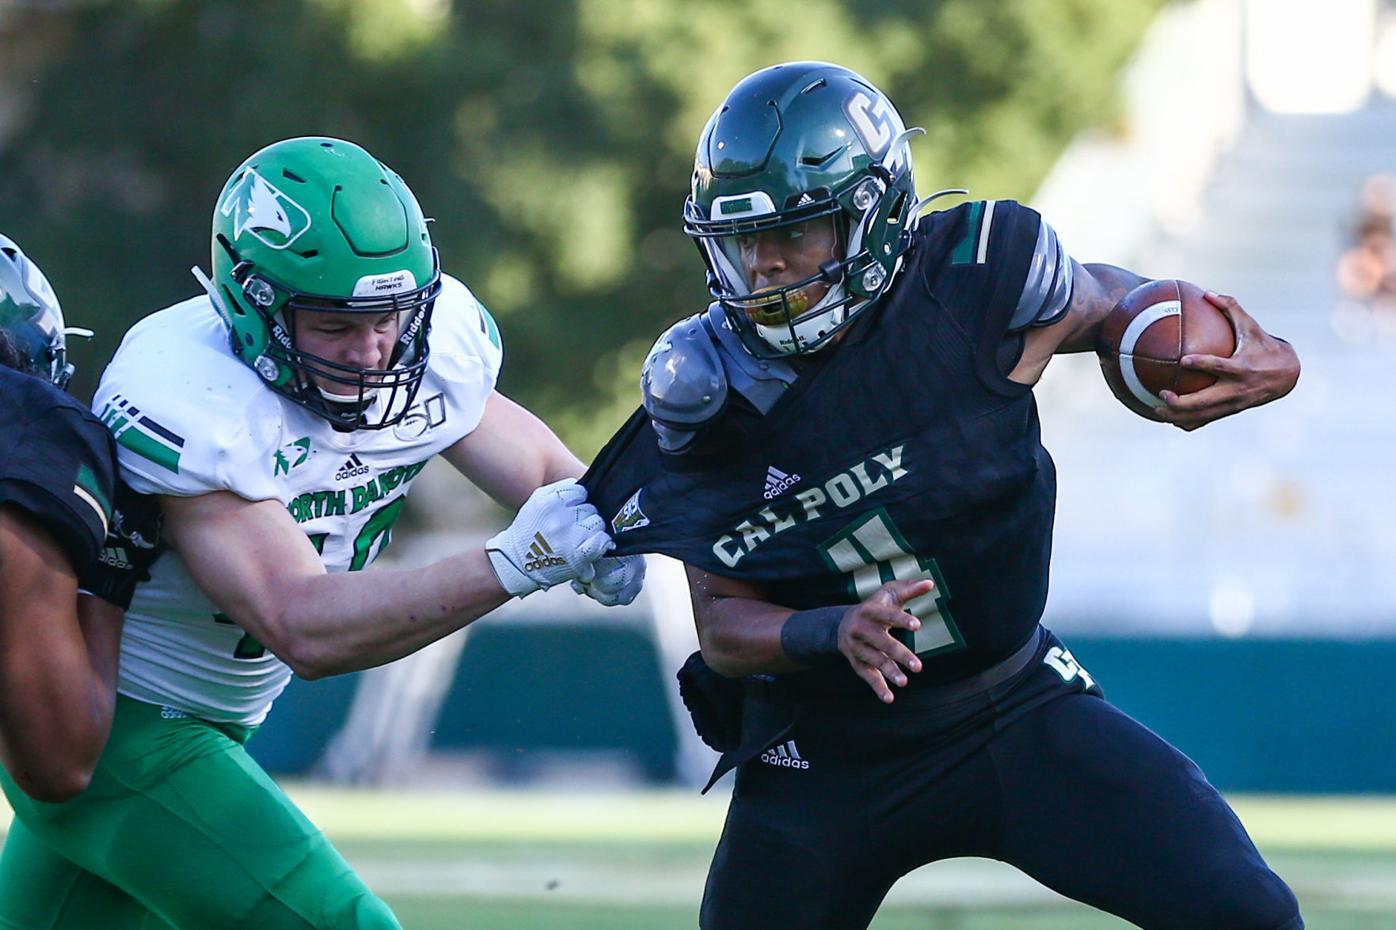 Photos: North Dakota edges Cal Poly 30-26 in Big Sky football Saturday night at Spanos Stadium